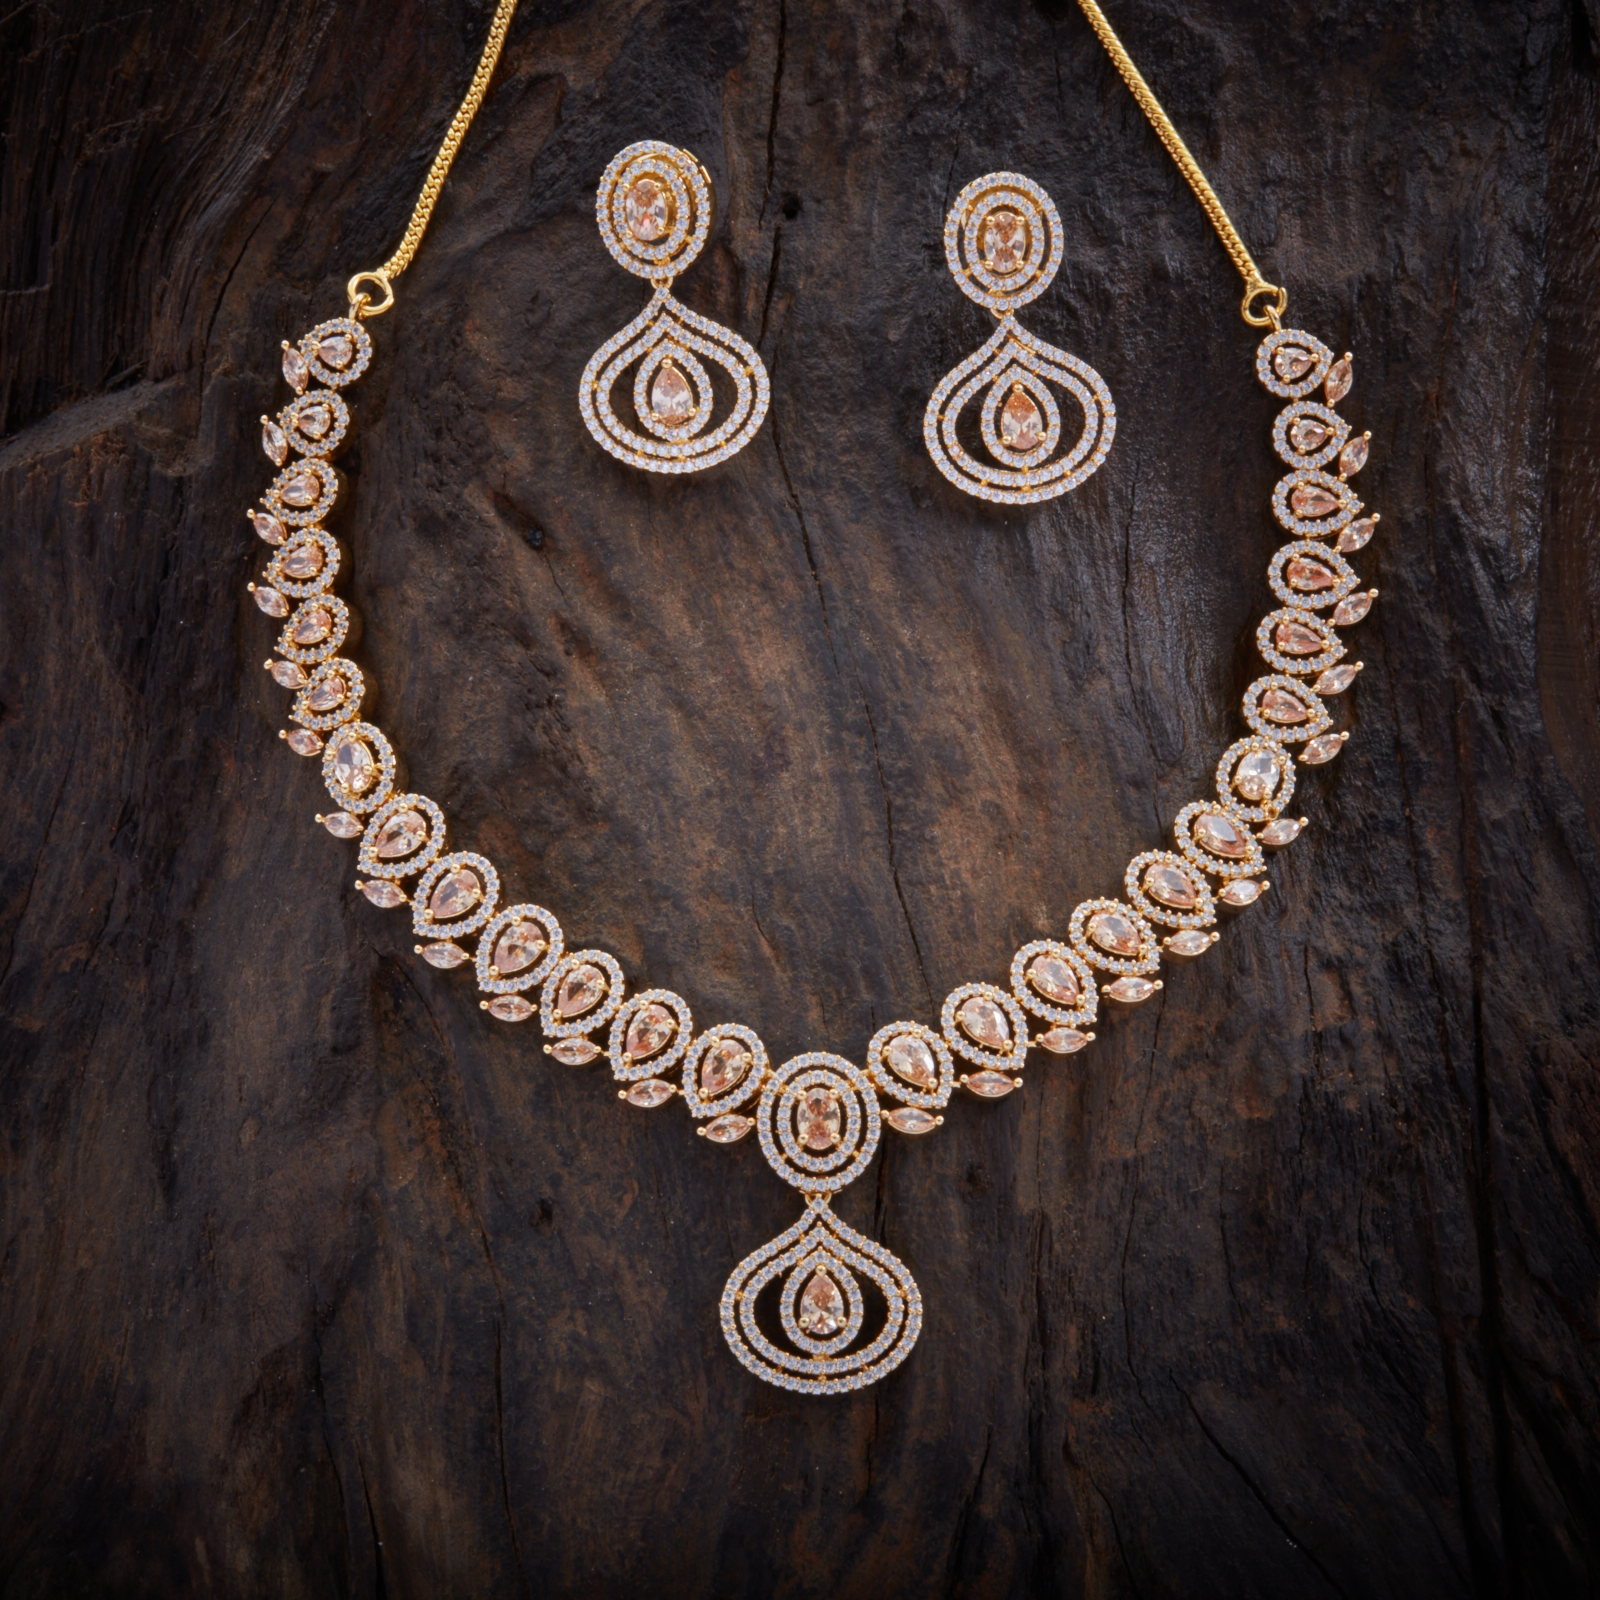 Pin by saranya karthi on gold jewelry pinterest fashion